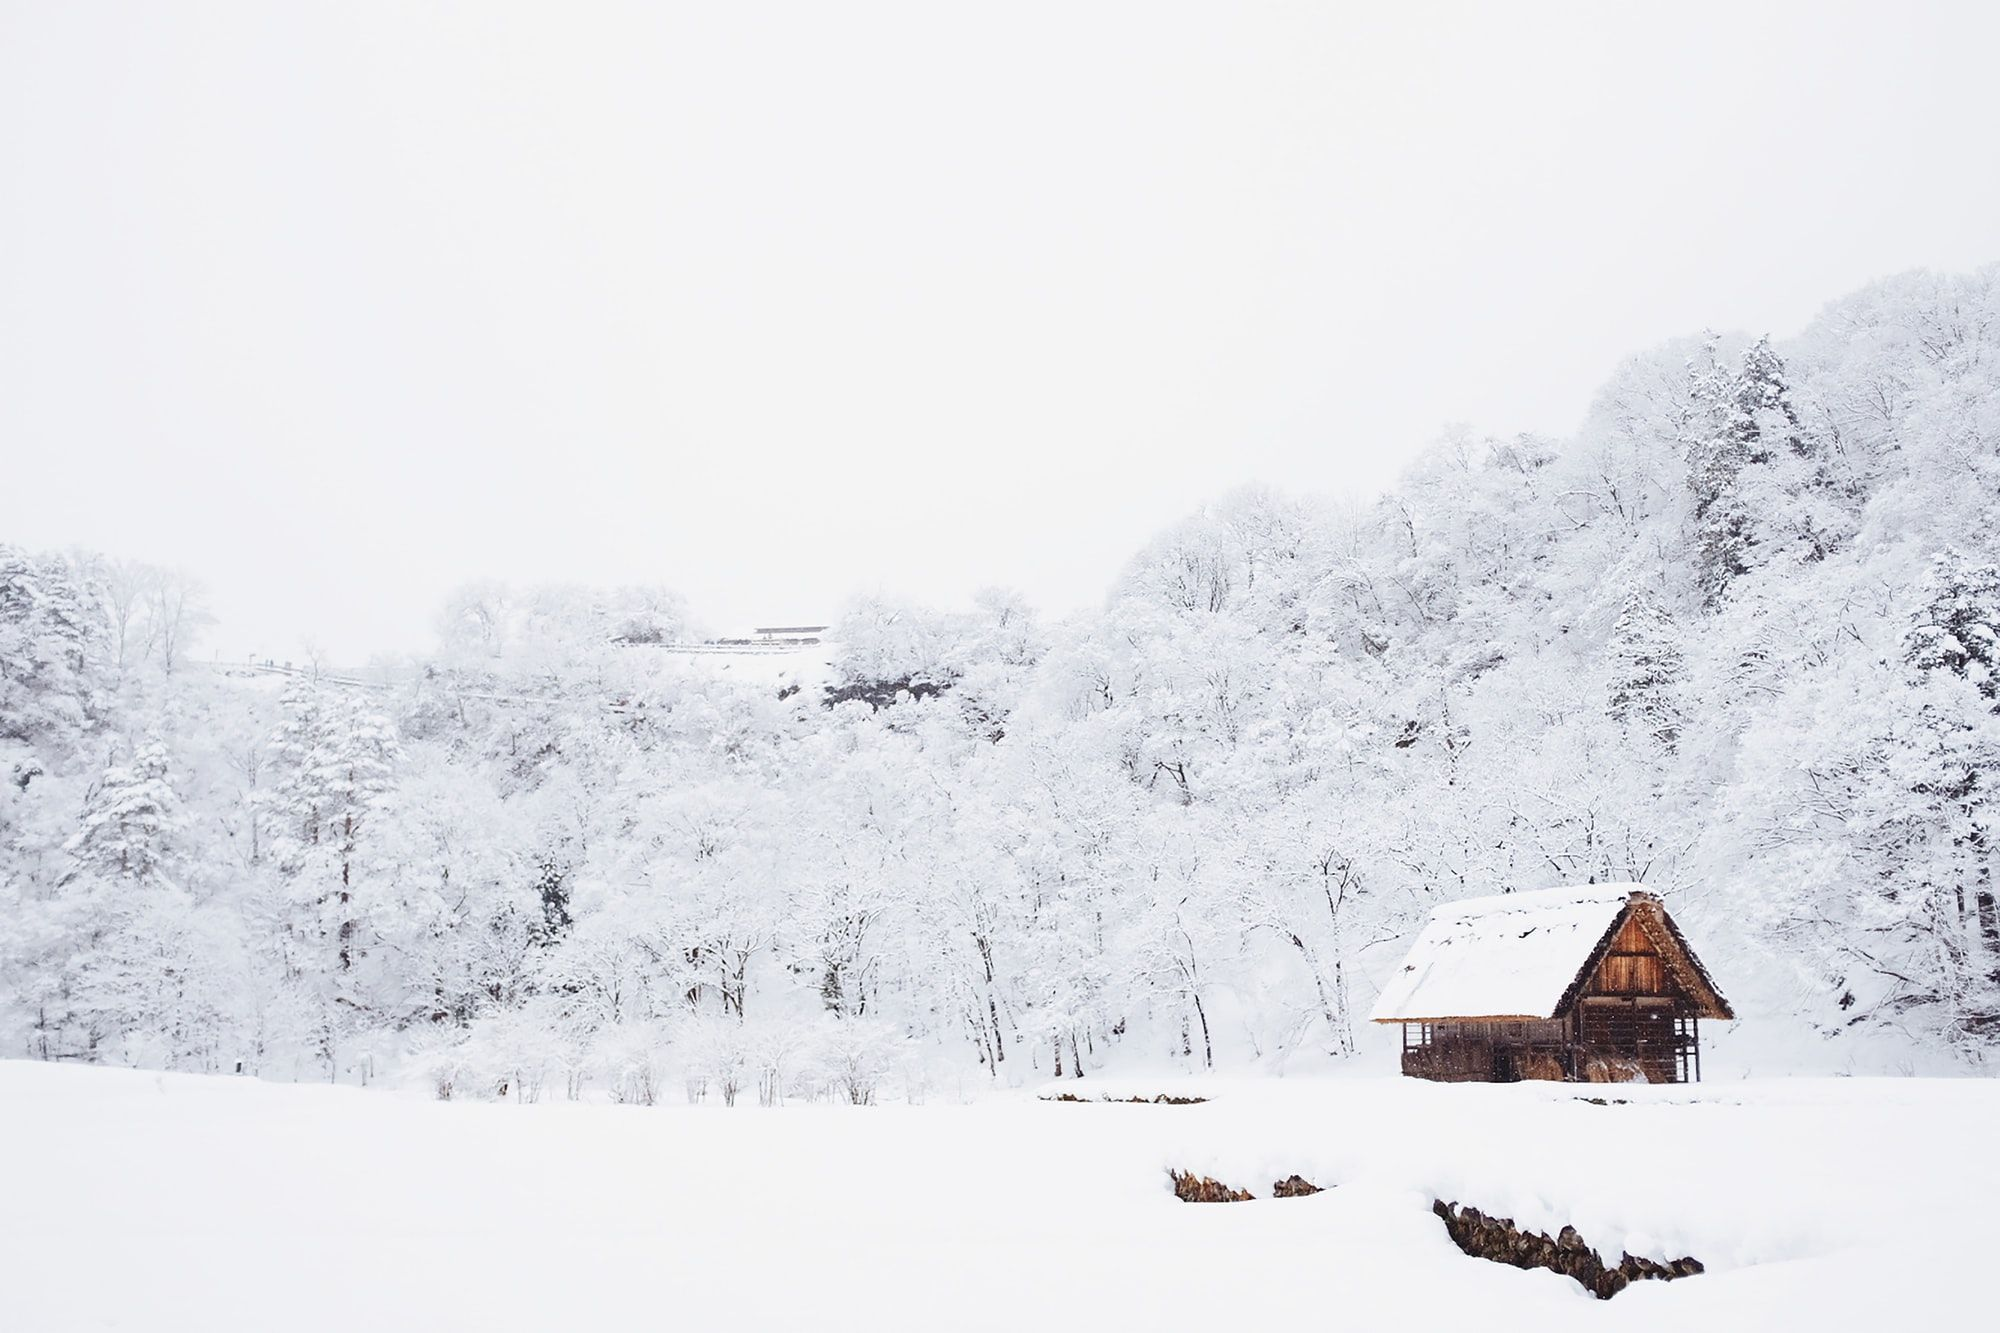 Winter Wonderland in Shirakawa, Japan